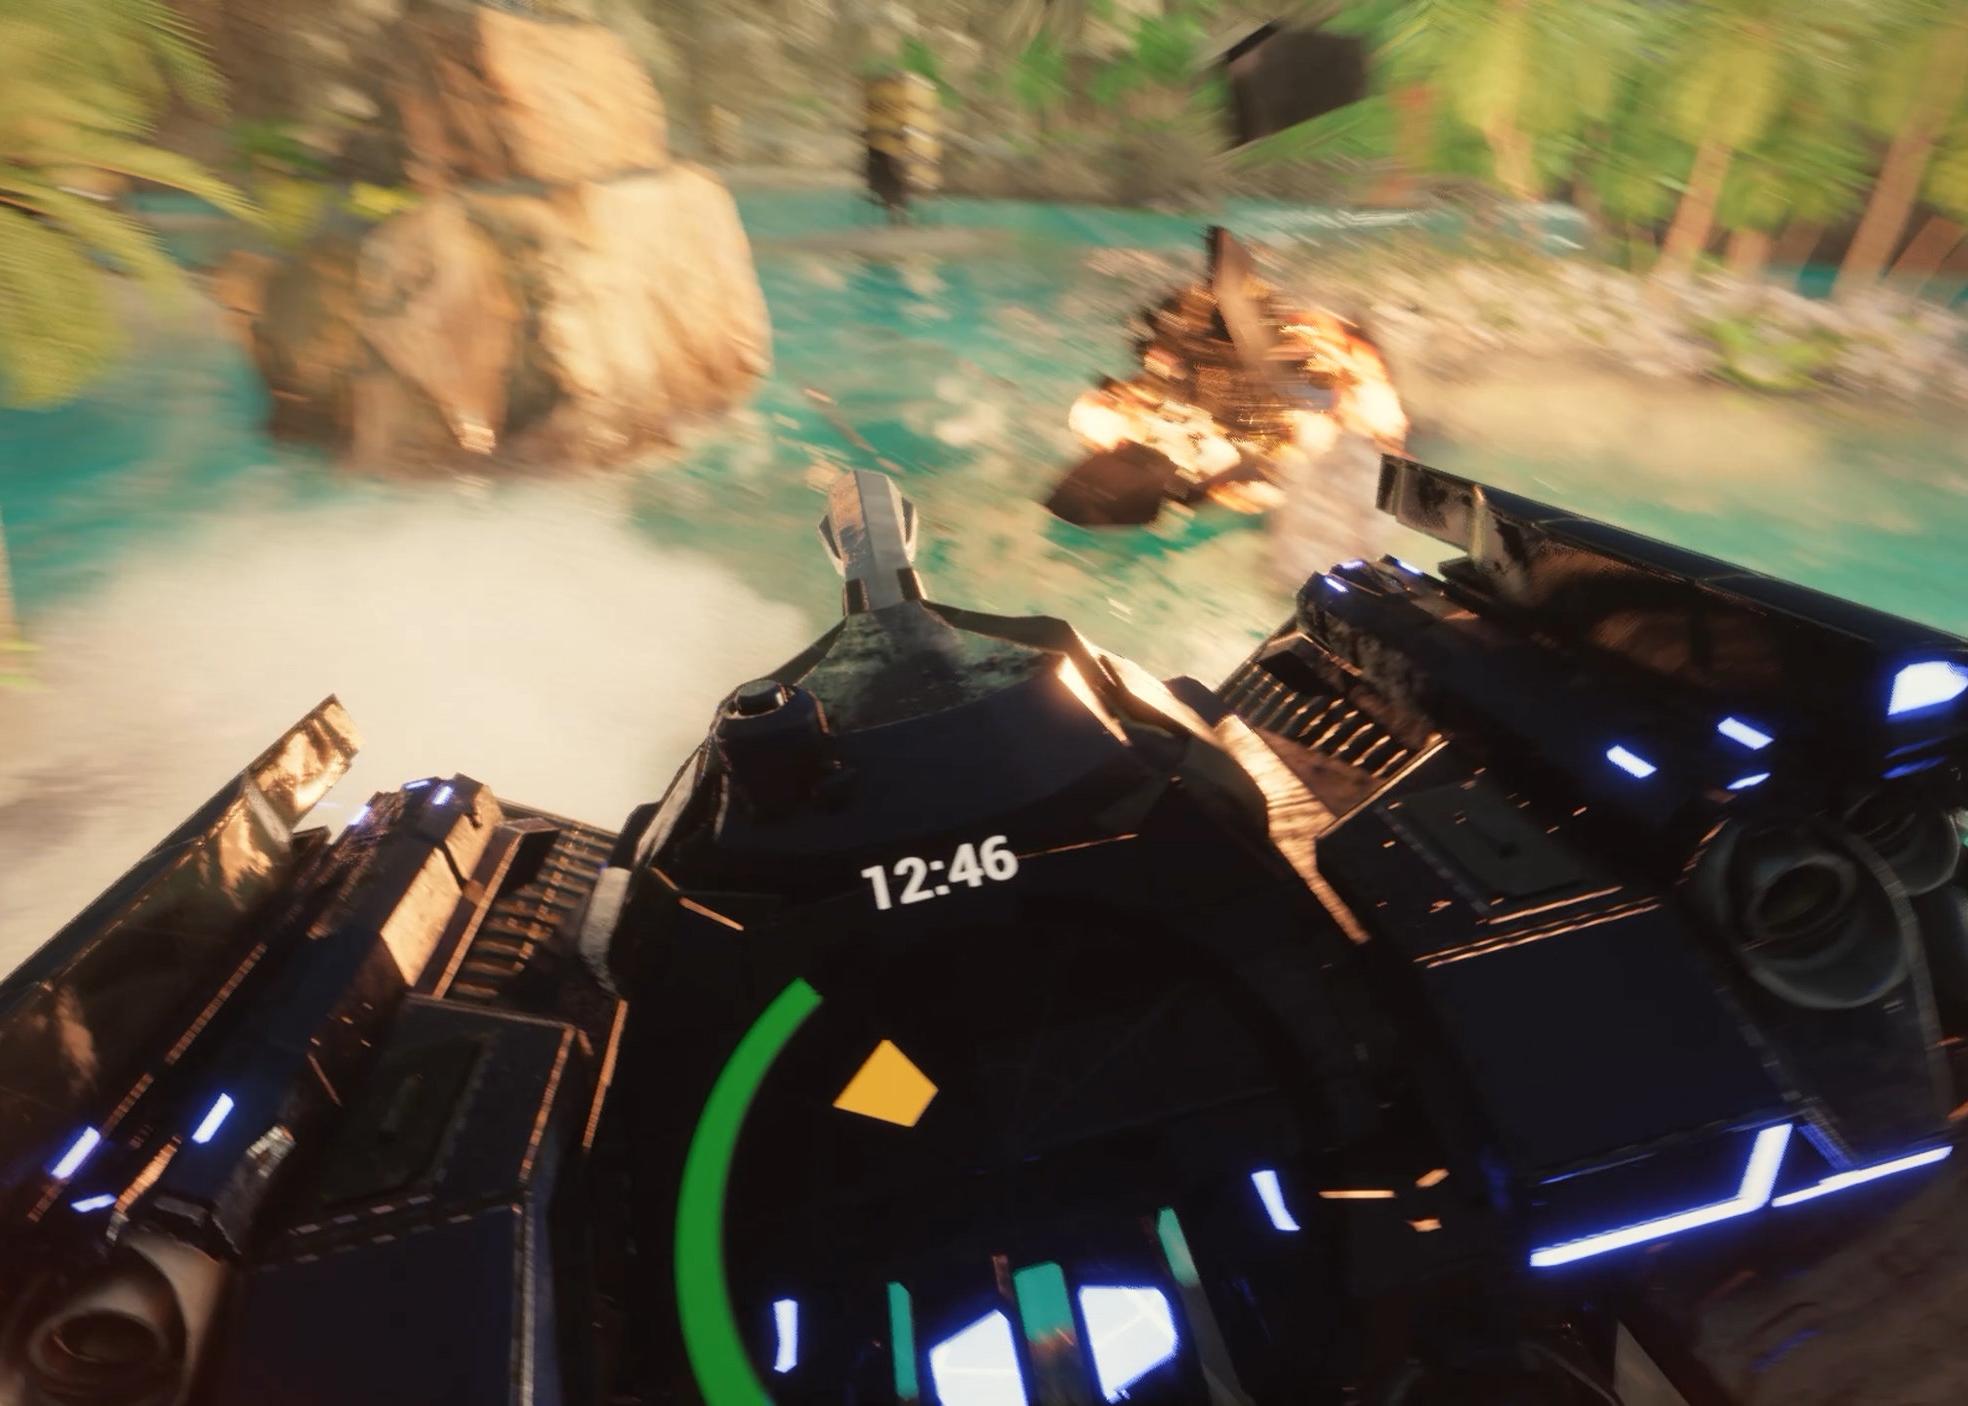 DESPOILER - Role: Gameplay Programmer, Game DesignerEngine: Unreal Engine 4, C++Description: Team Objective Arena Racer. PC Game Shipped on Steam 2018